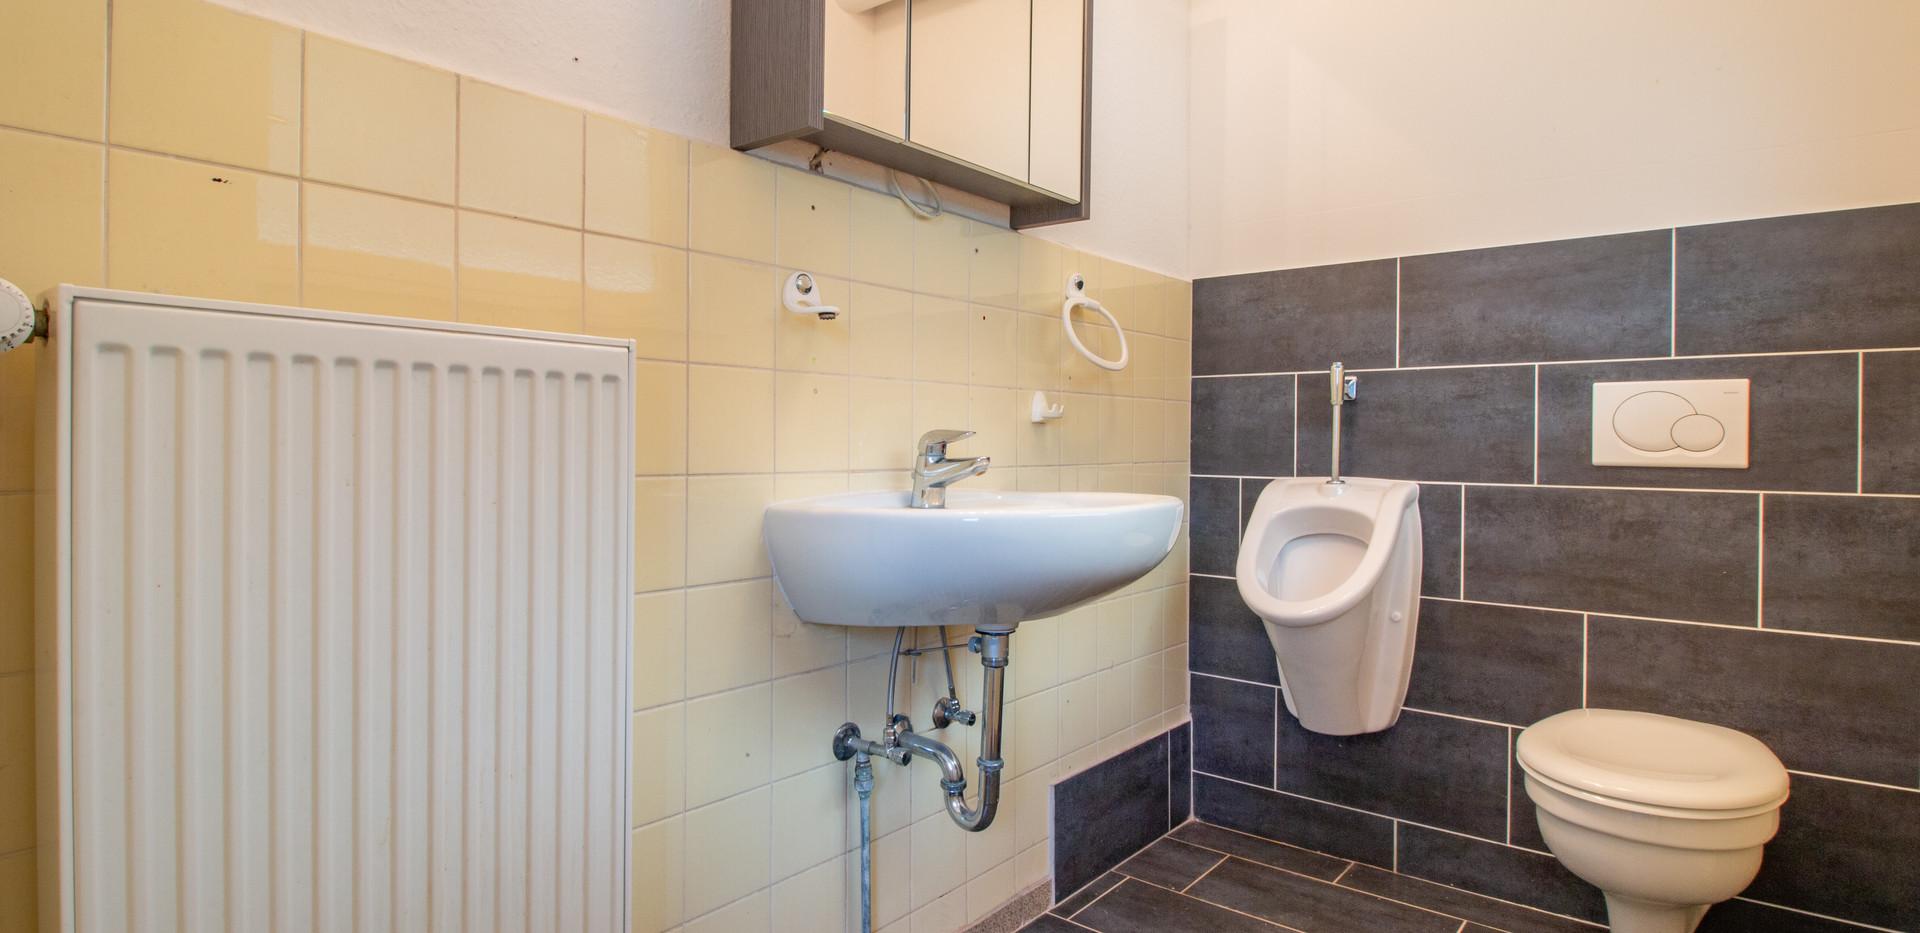 Toilette EG